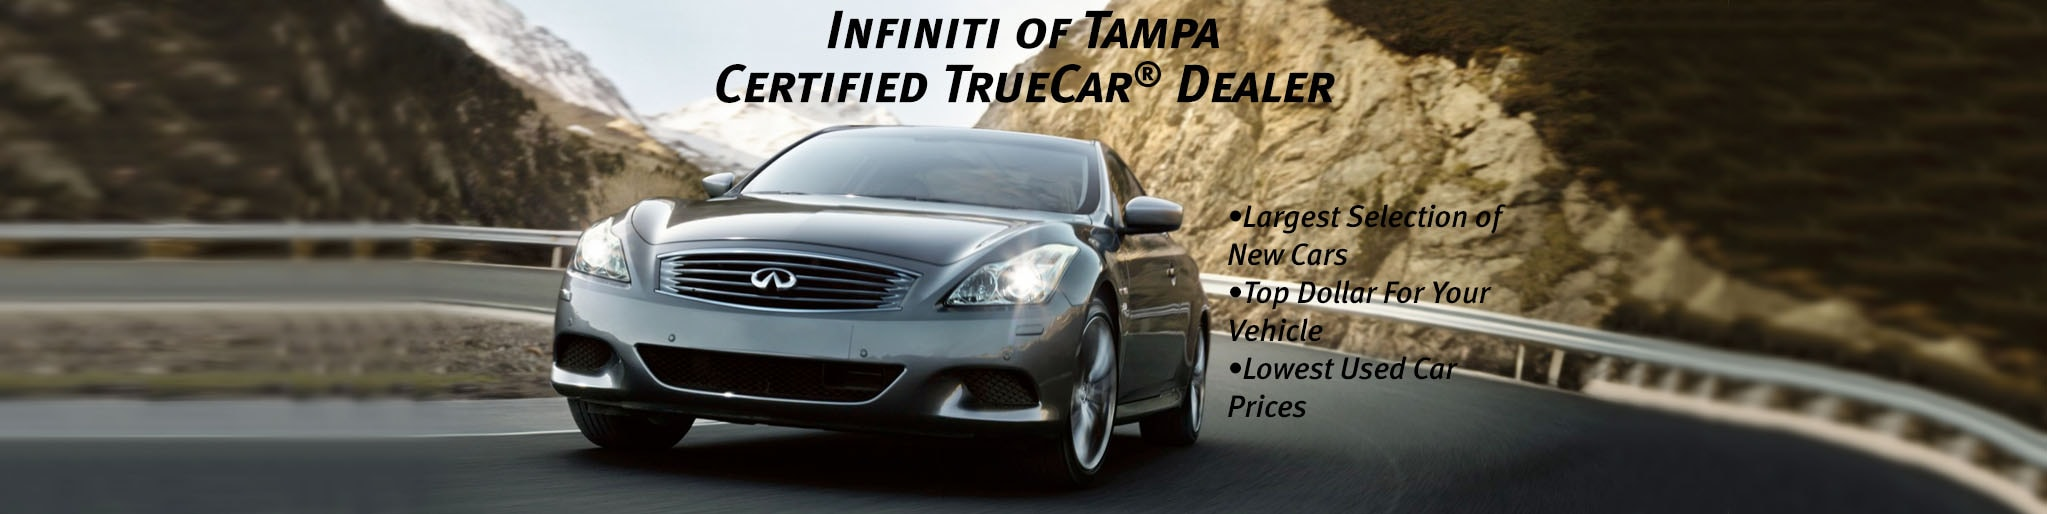 certified infiniti truecar dealer infiniti of tampa. Black Bedroom Furniture Sets. Home Design Ideas